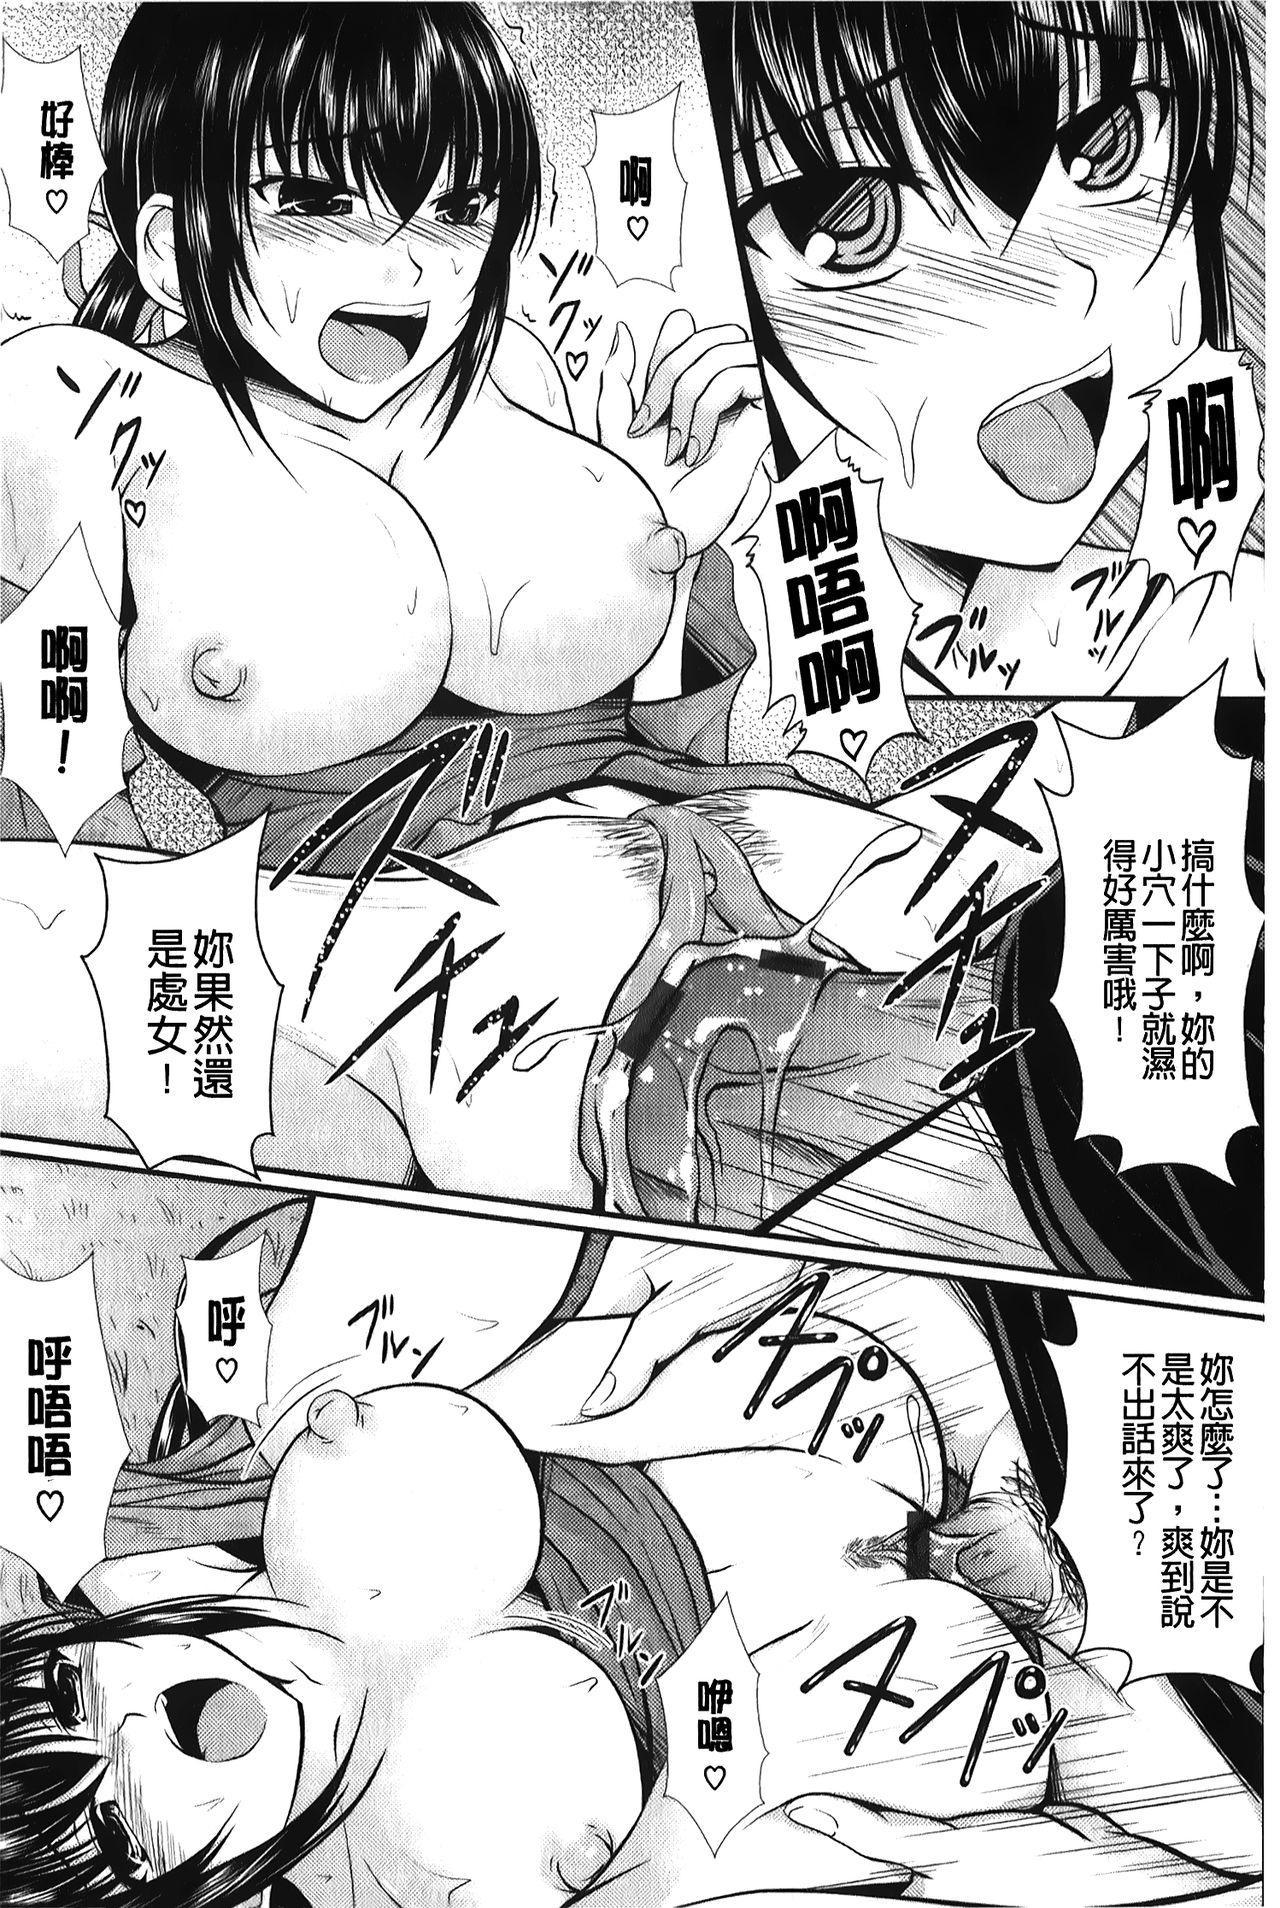 Hameochi | 戳插墮落 97